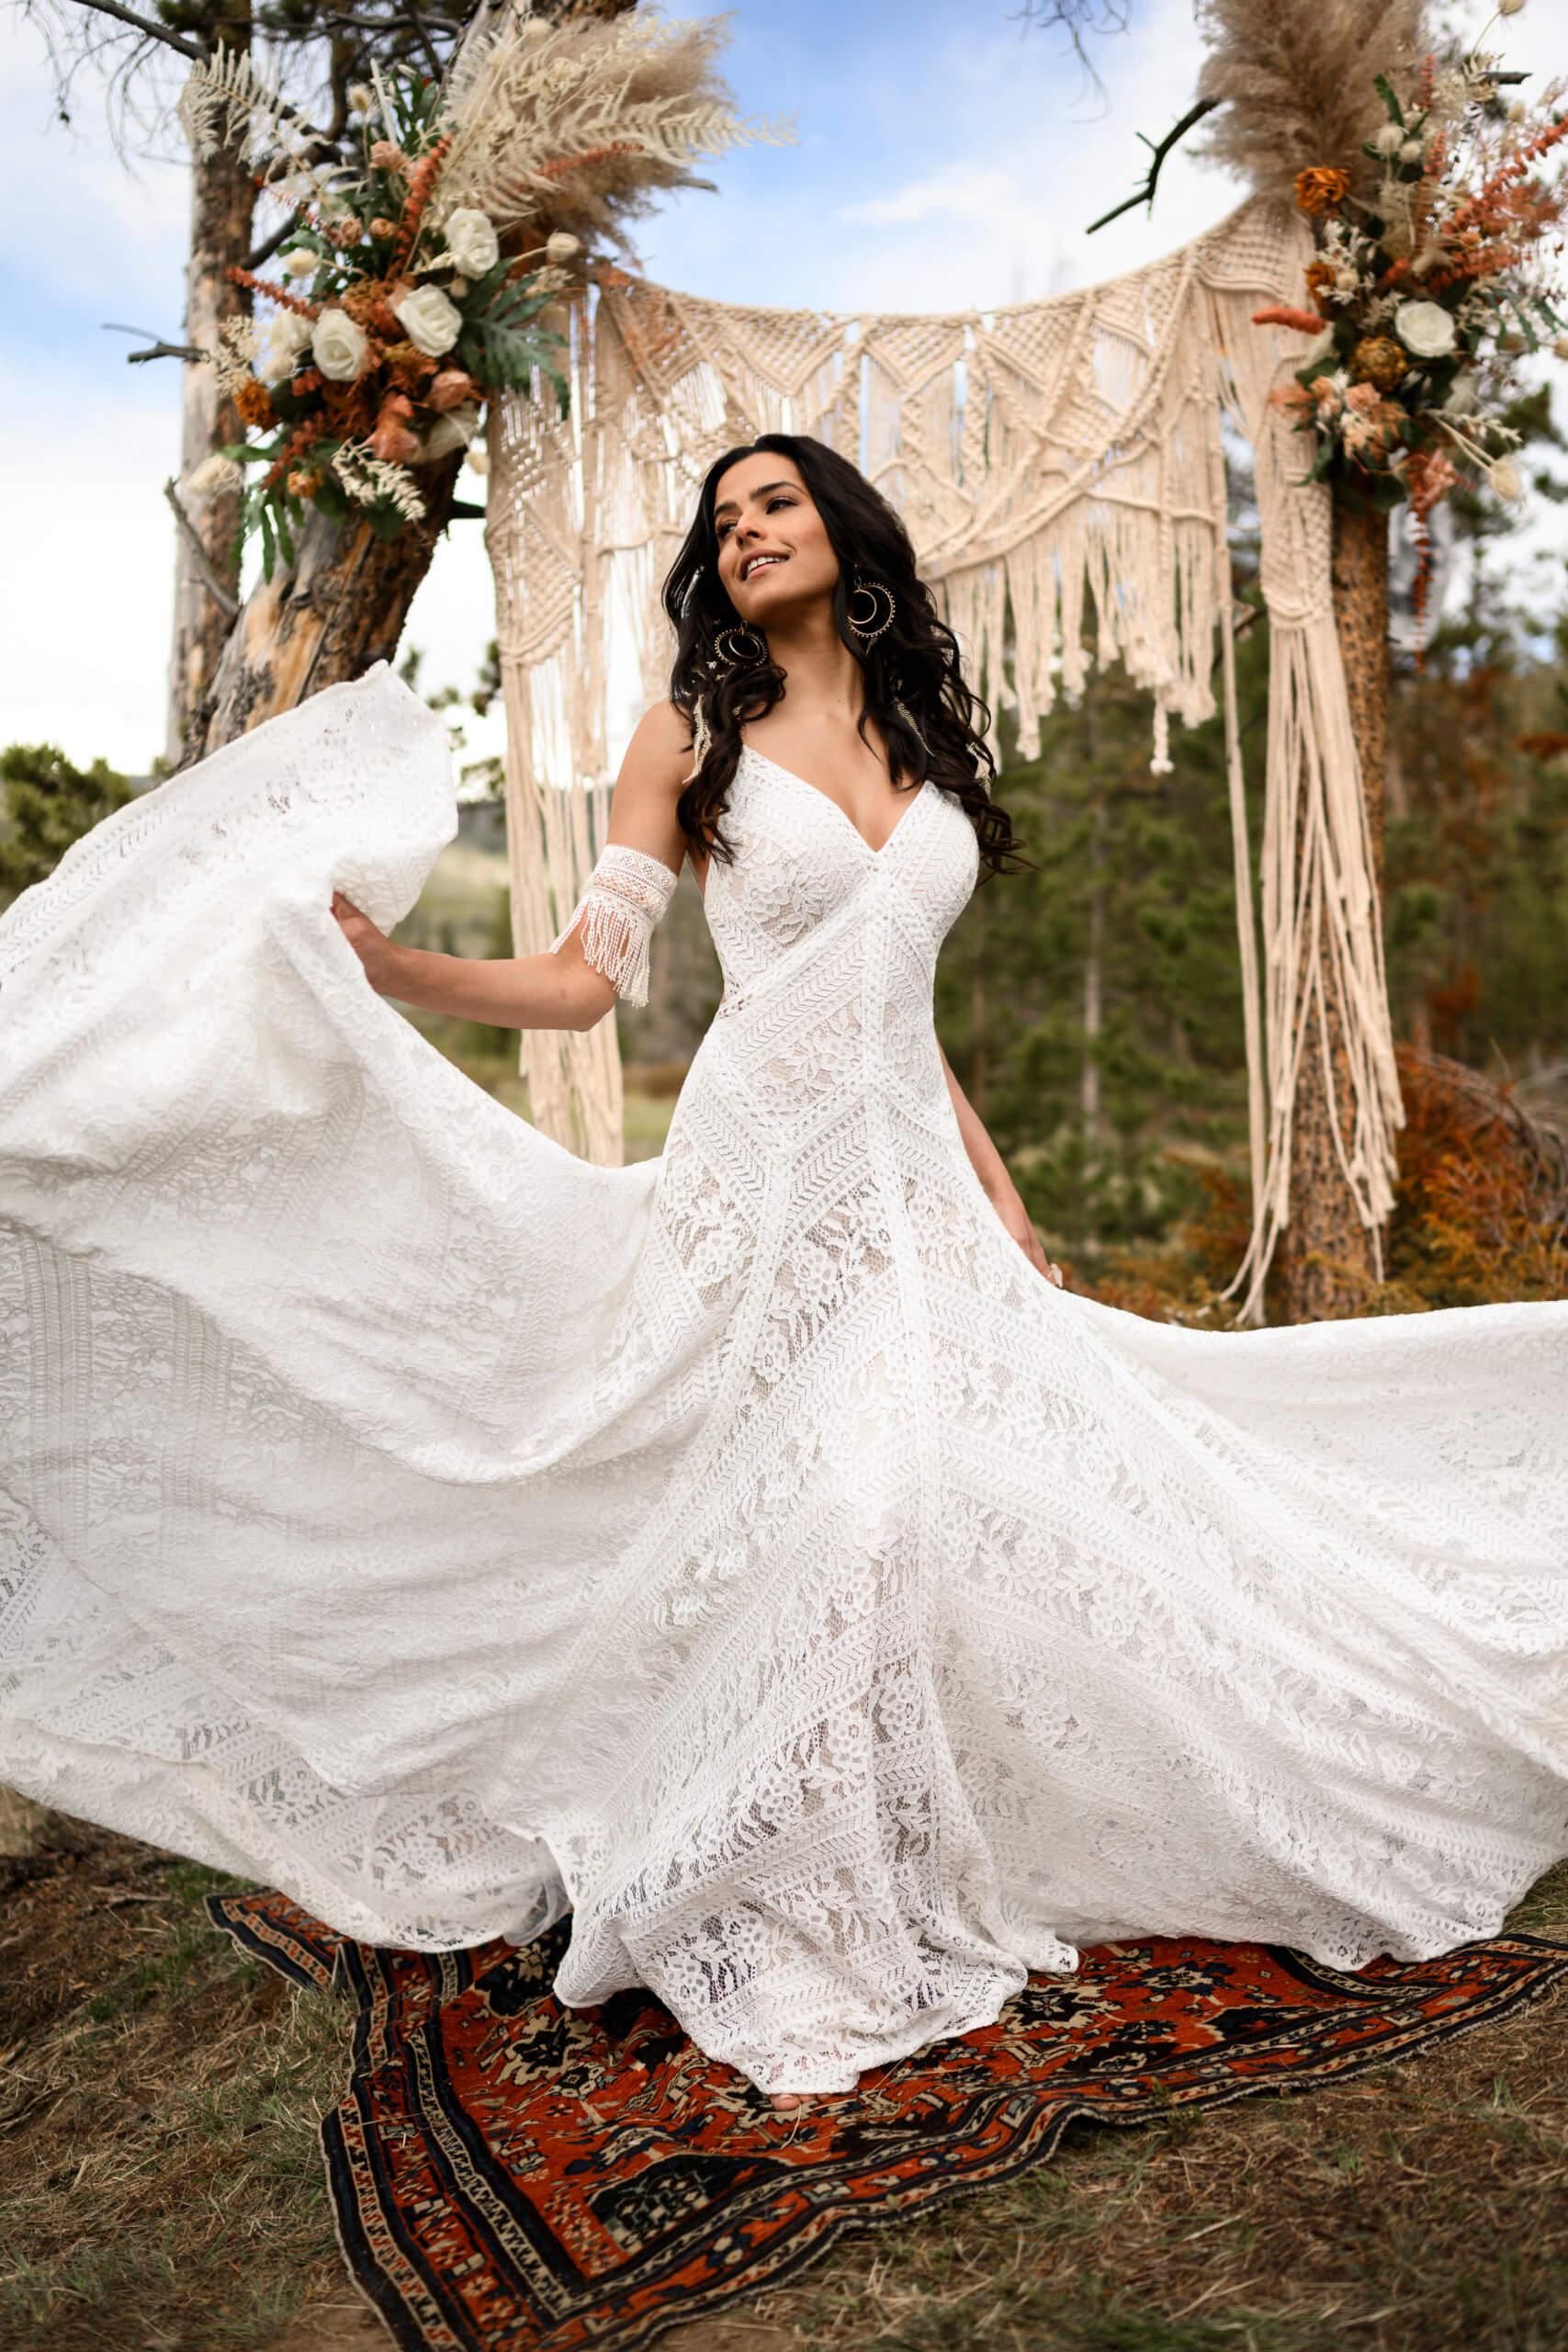 Boho Wedding Dresses Michigan Bridal Boutique The White Dress